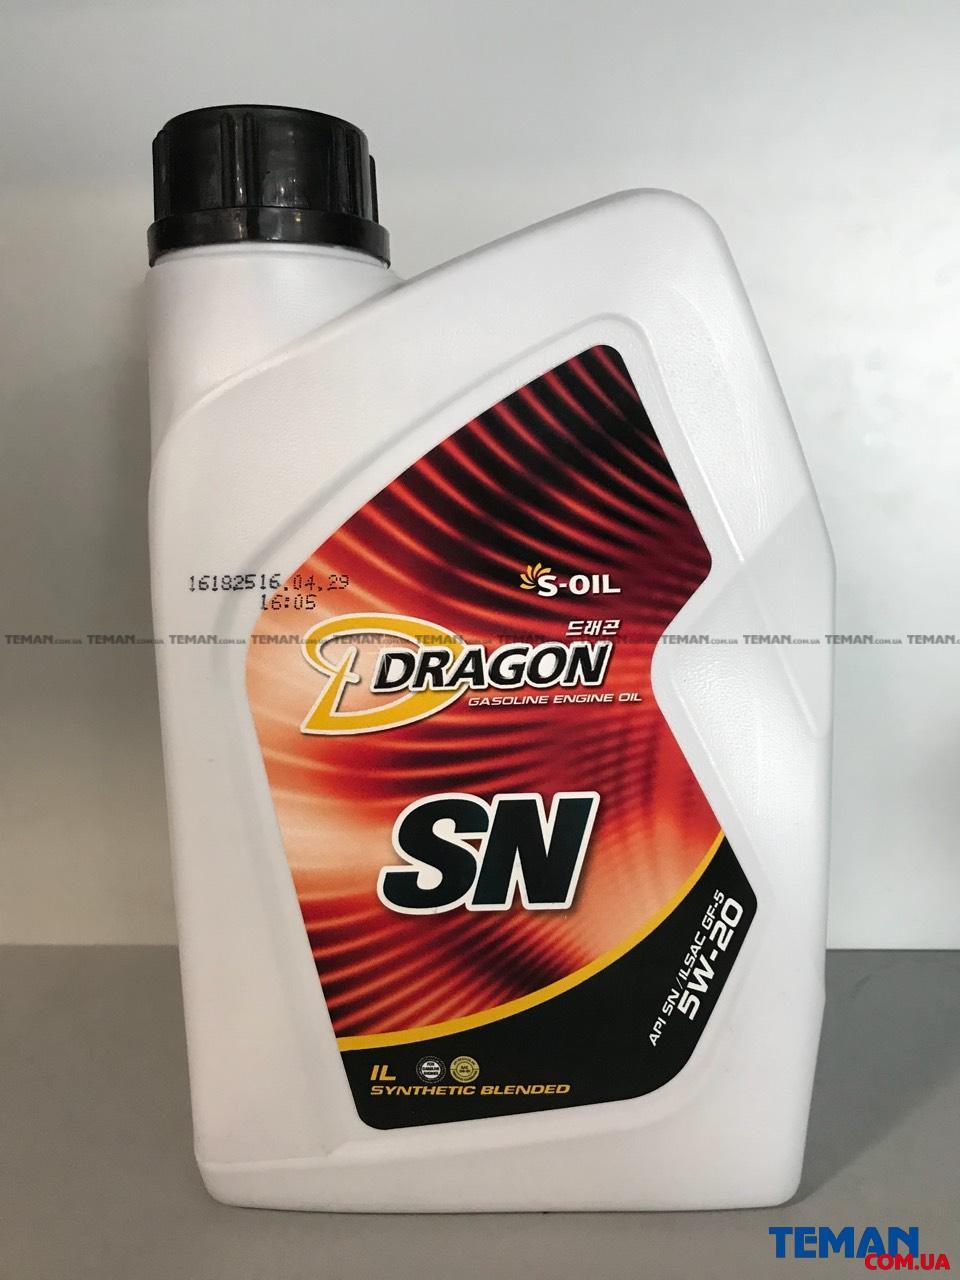 S-OIL DRAGON SN 5W20 1л полусинтетическое, бензиновое